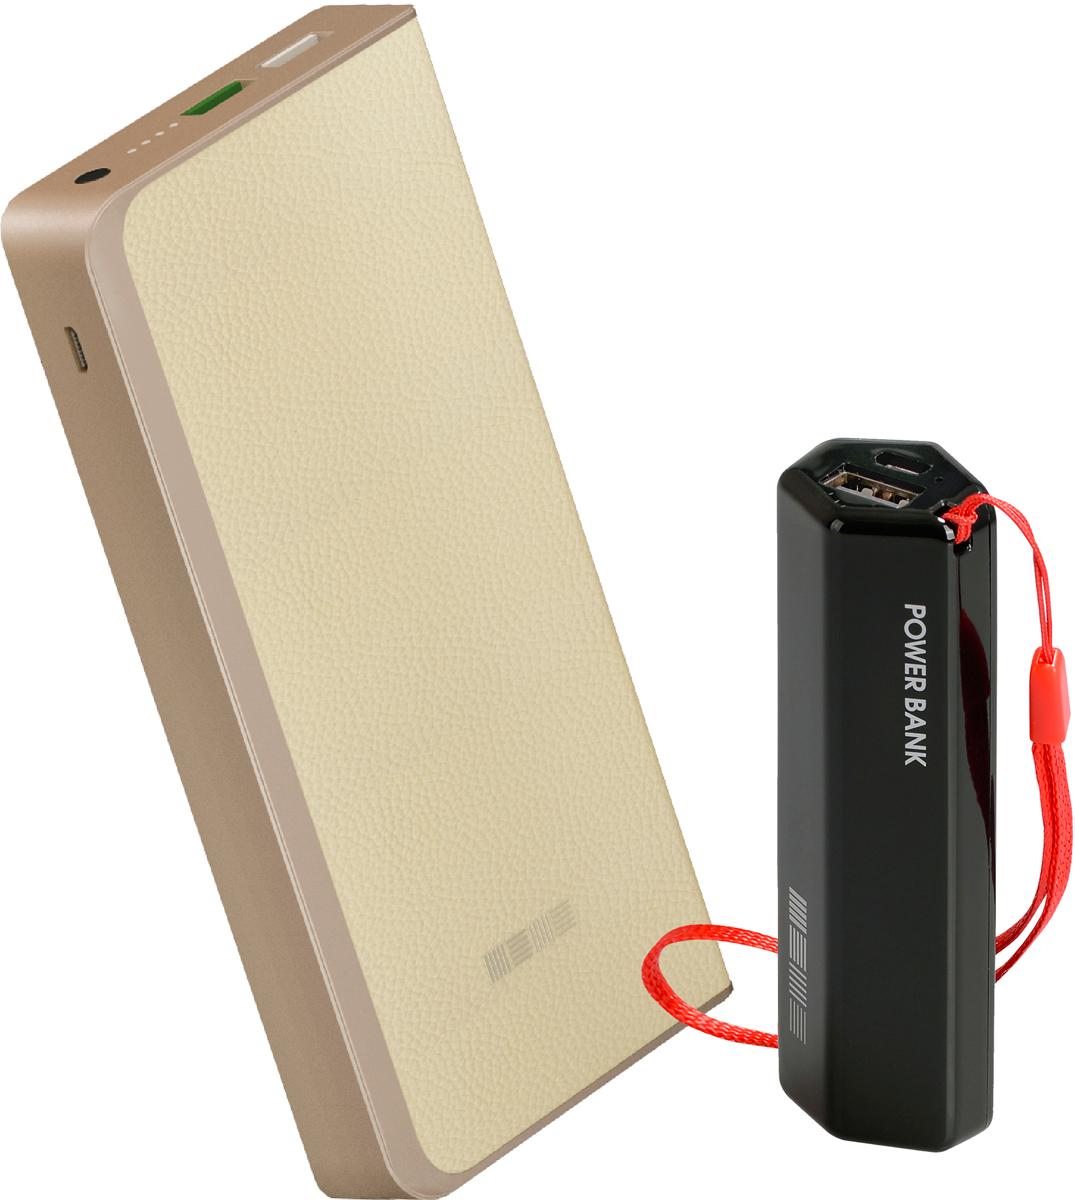 все цены на  Interstep PB12000QC (12000 мАч), Beige + PB30001 (3000 мАч) комплект внешних аккумуляторов  онлайн